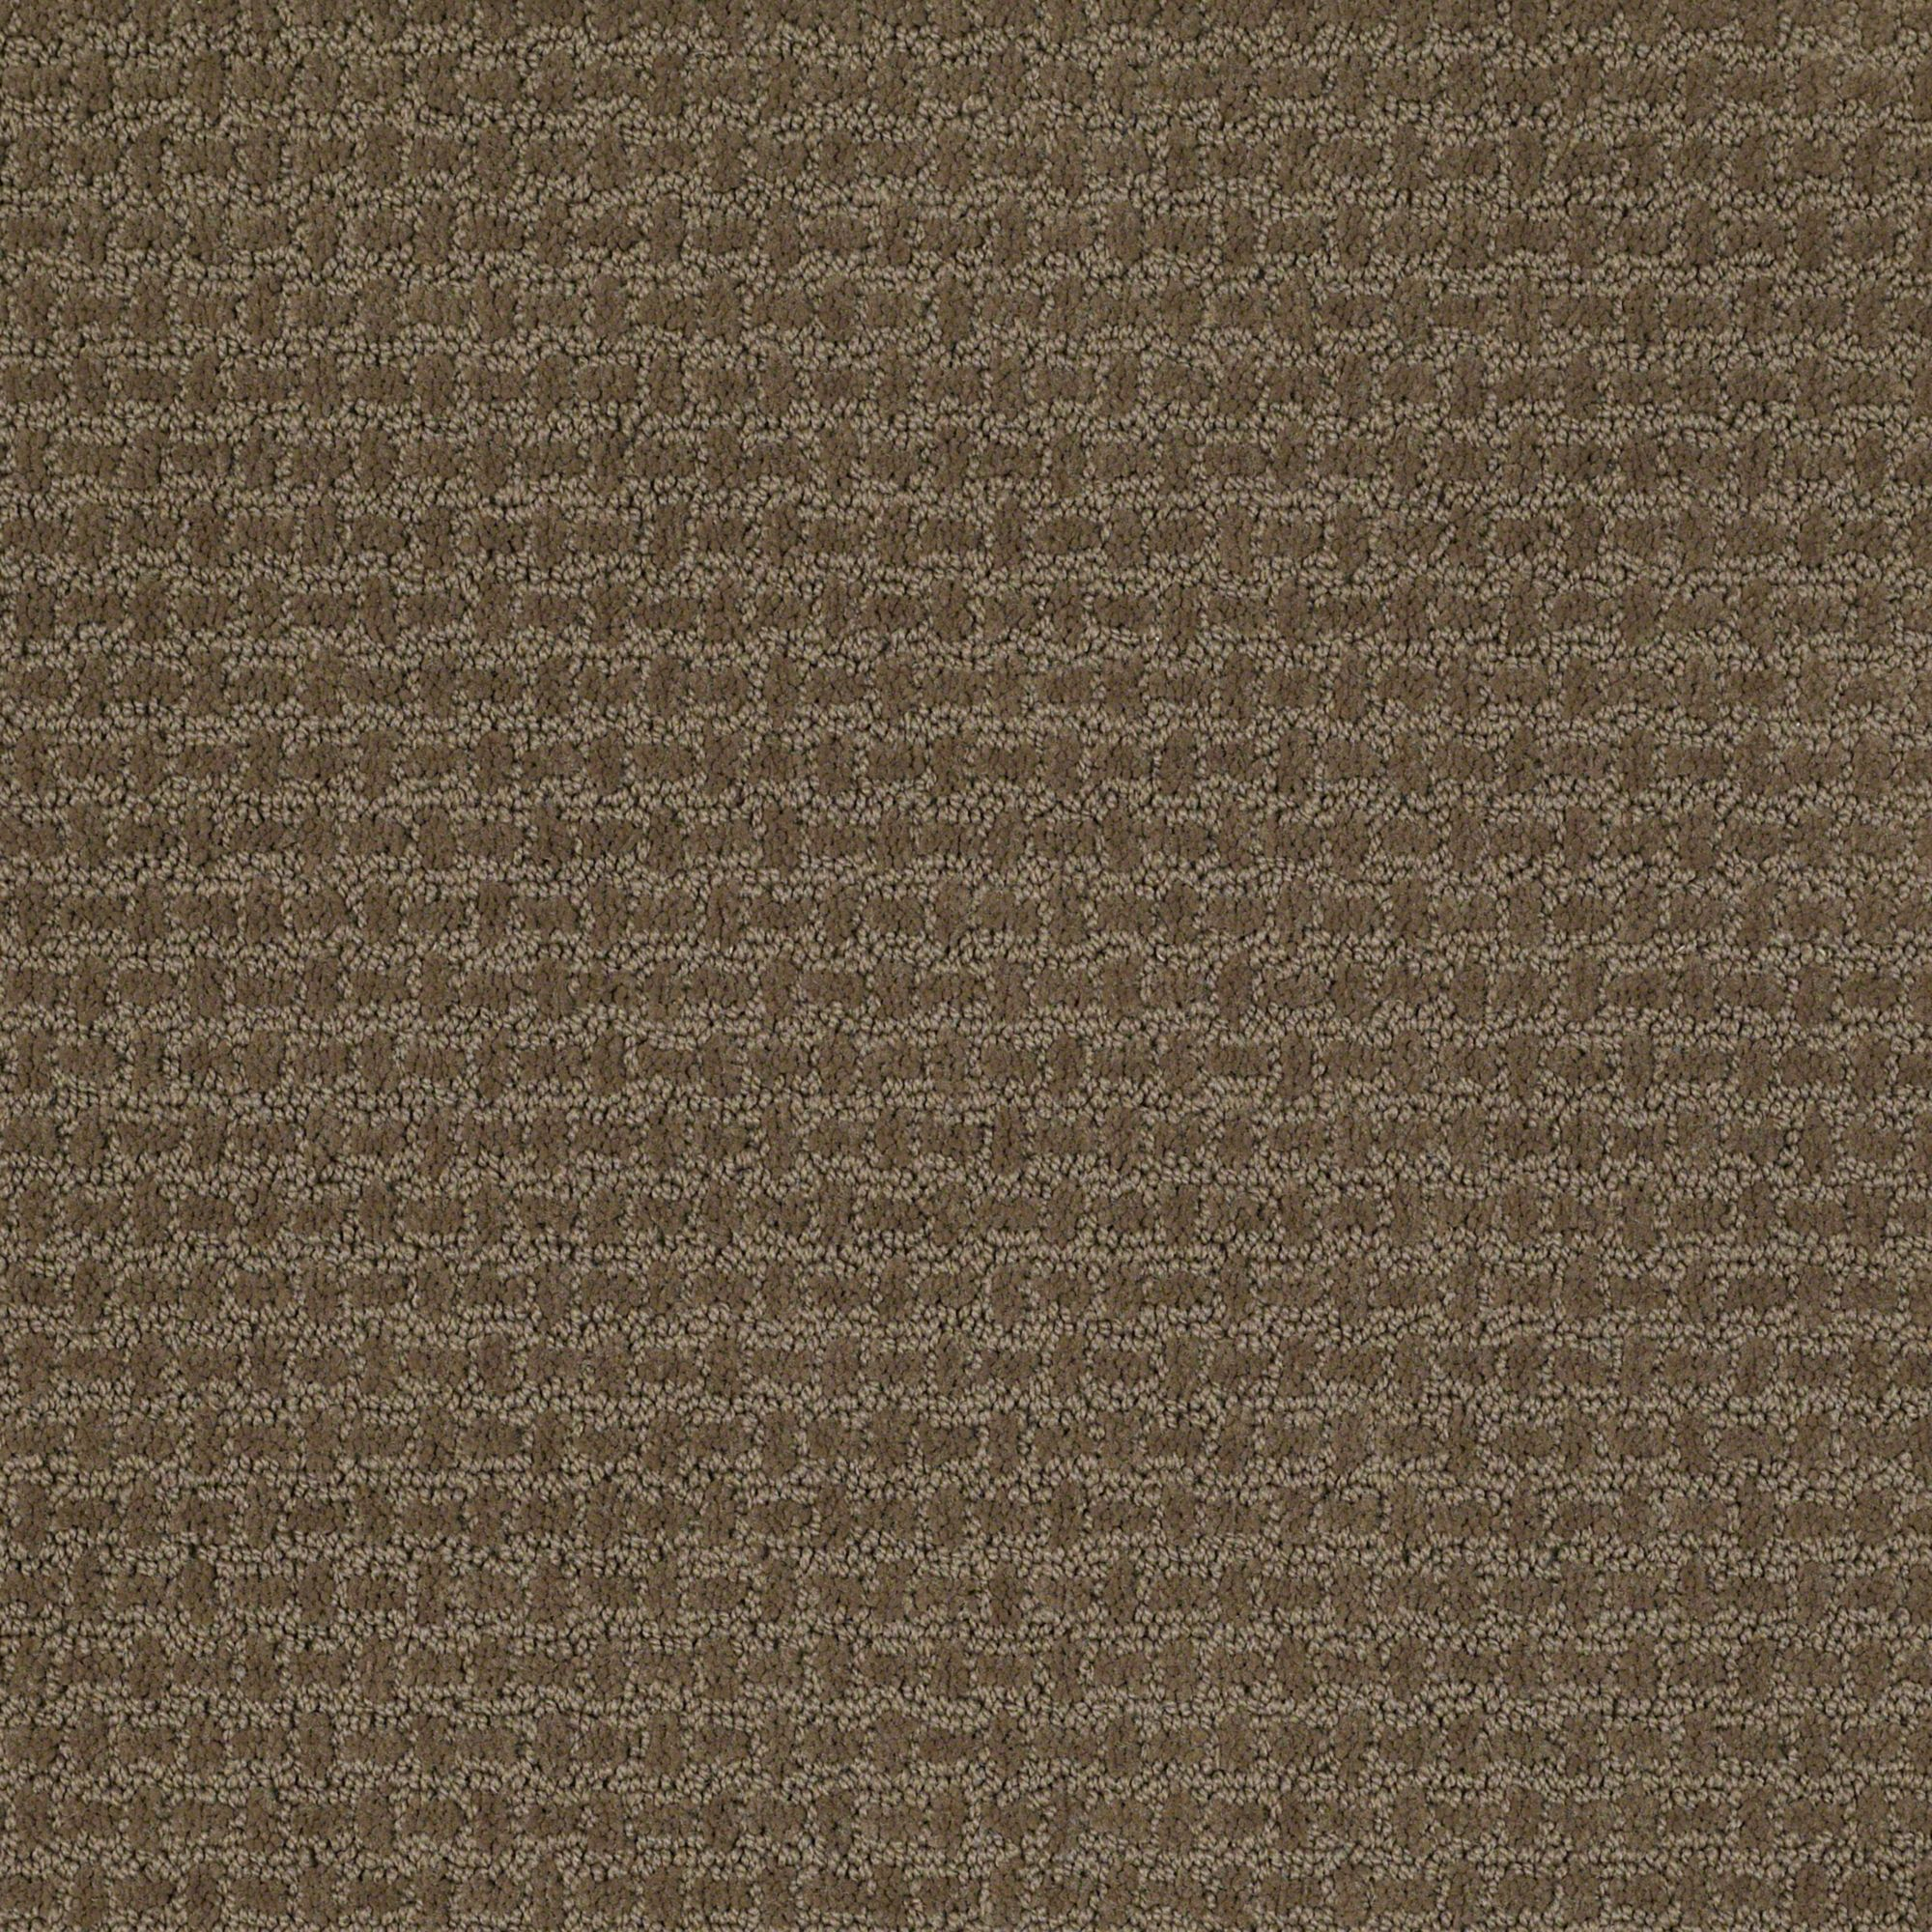 Kick Off Townhouse Carpet samples, Diy carpet cleaner